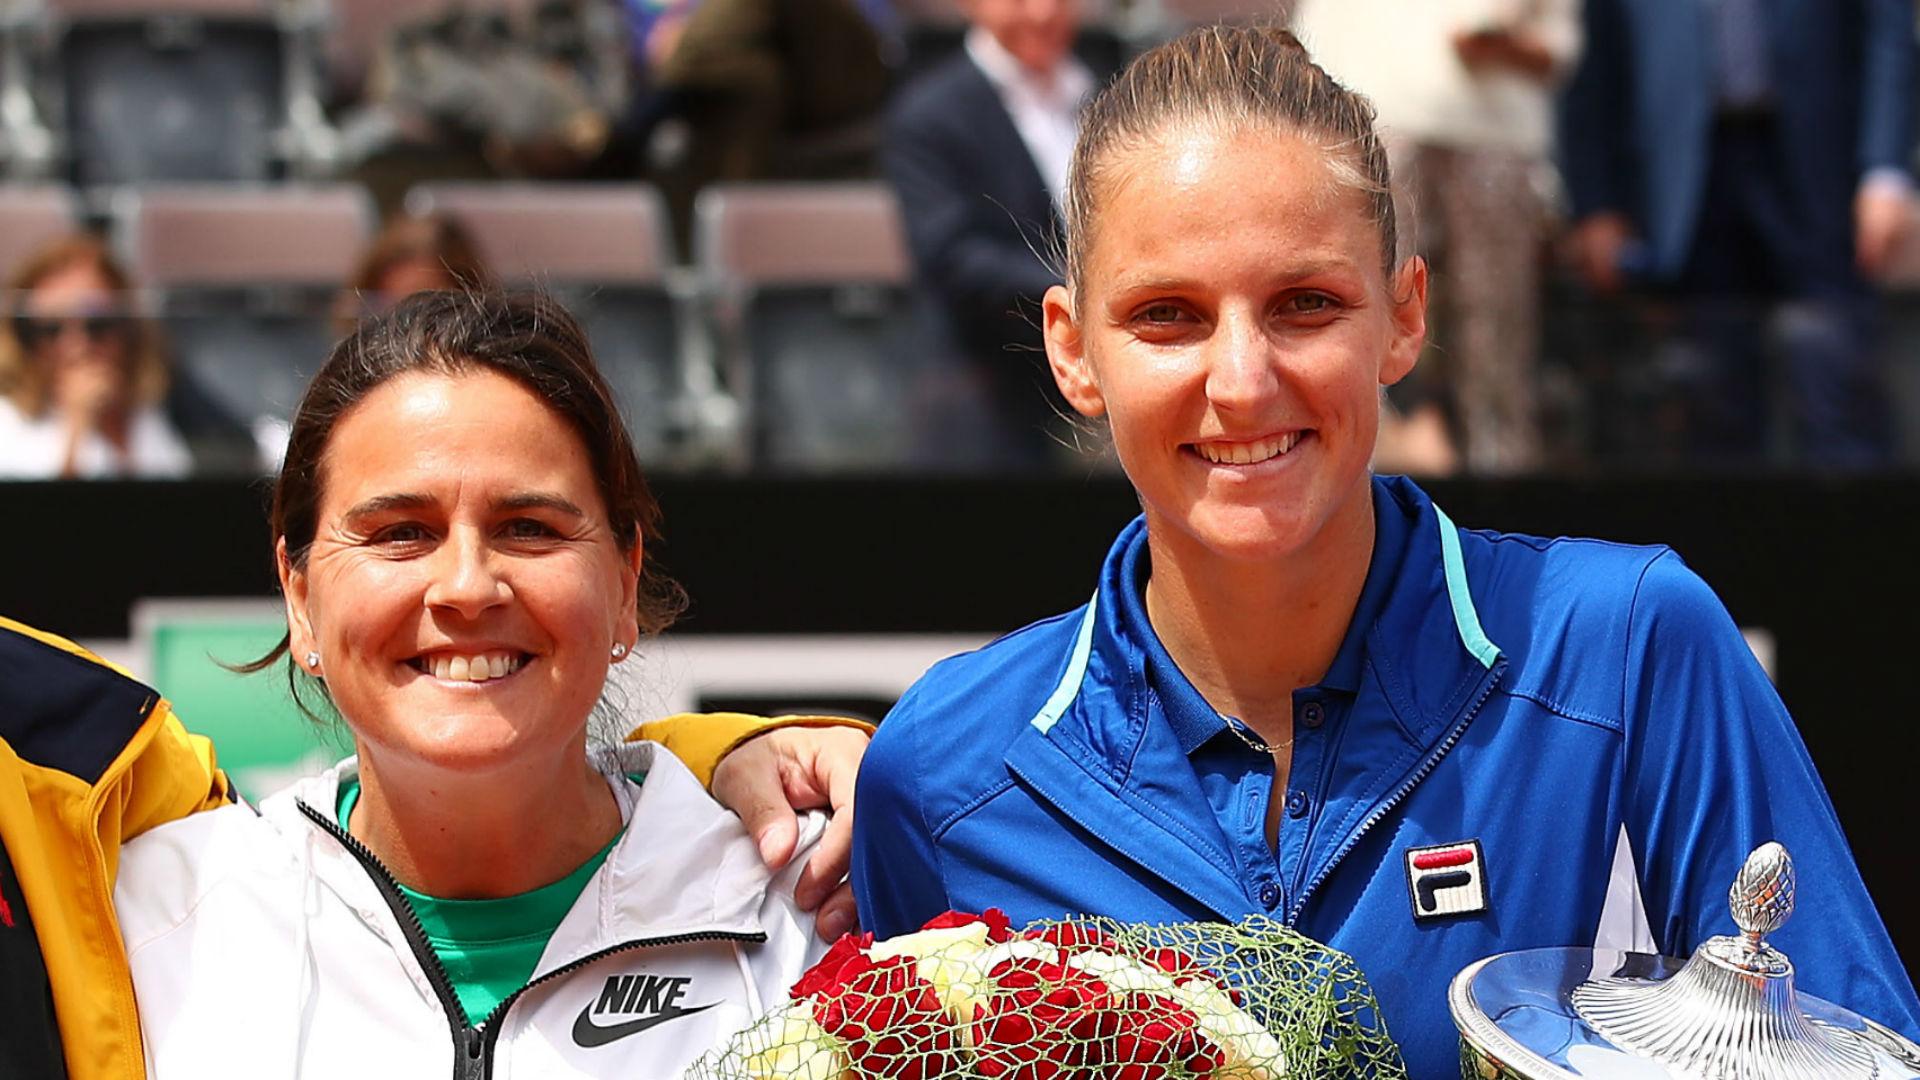 Former Wimbledon champion Conchita Martinez will no longer be Karolina Pliskova's coach, the world number two has announced.